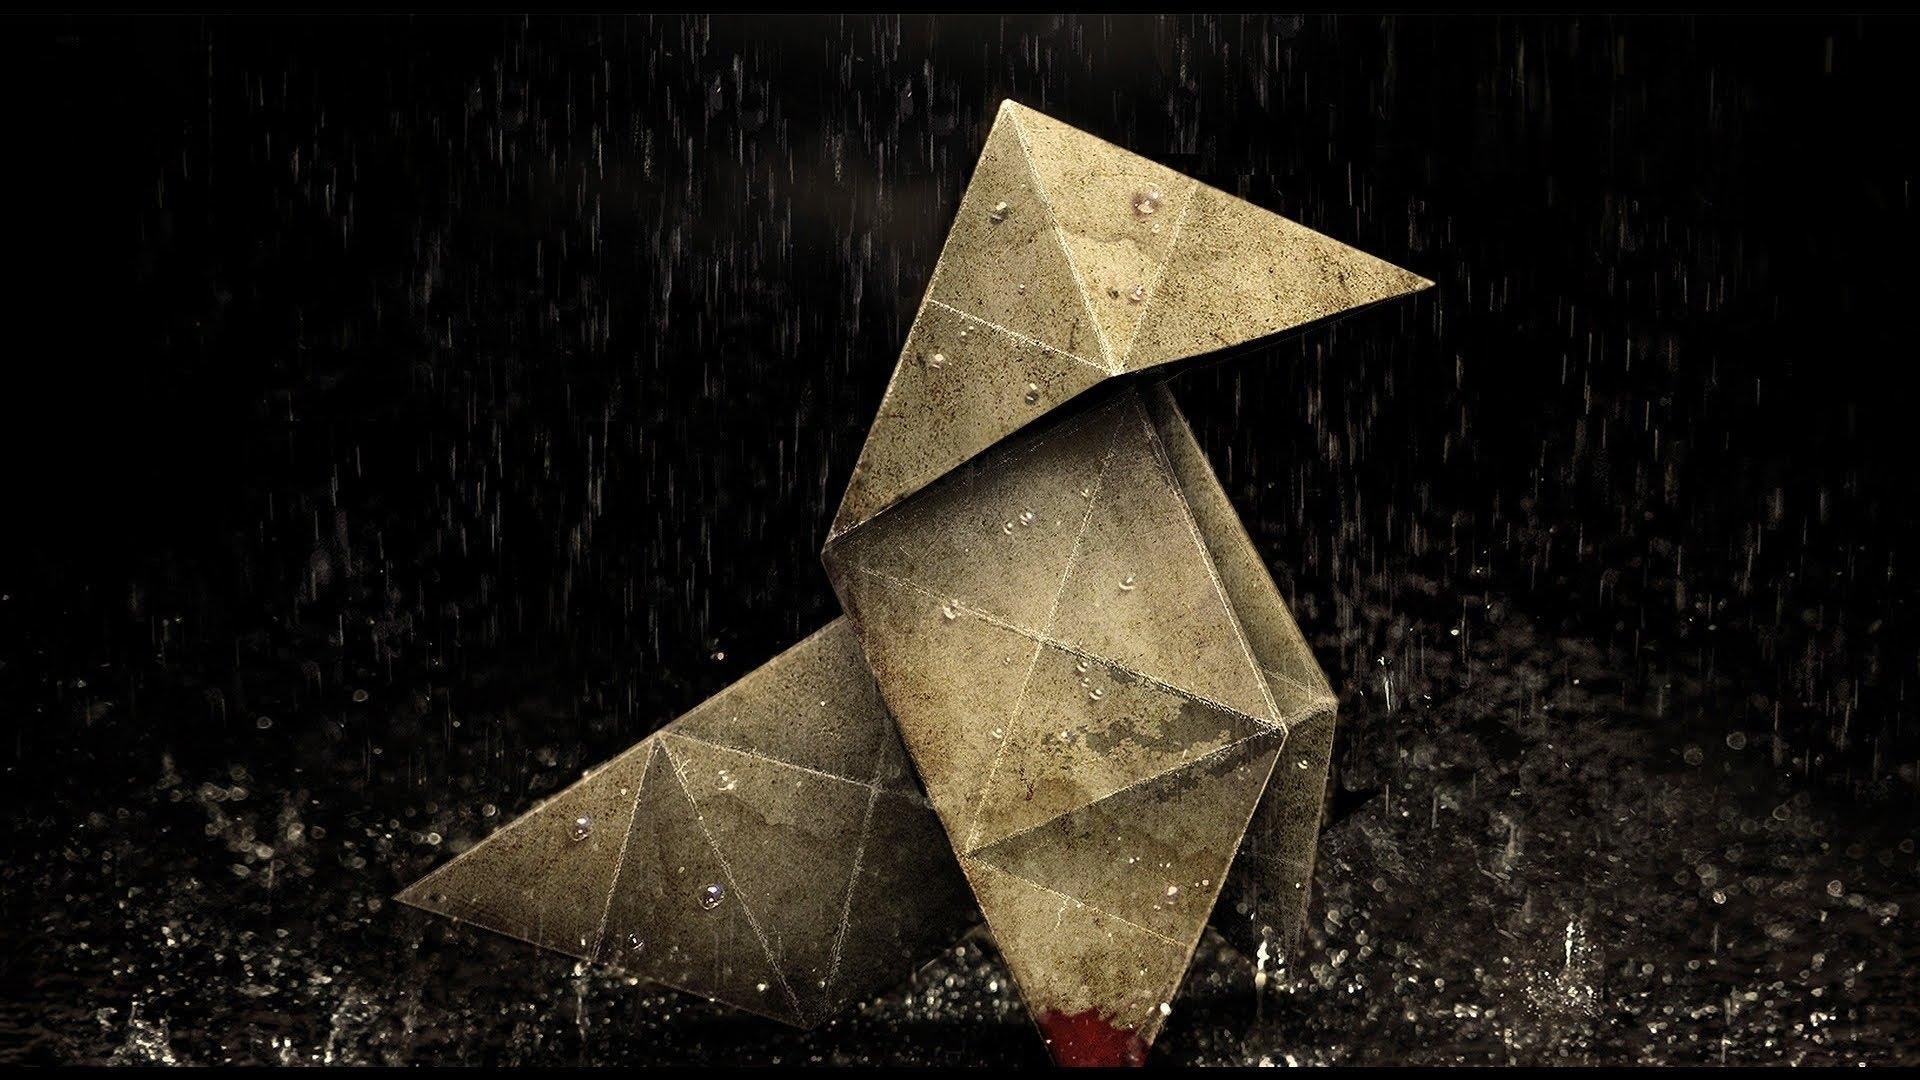 Origami in rain